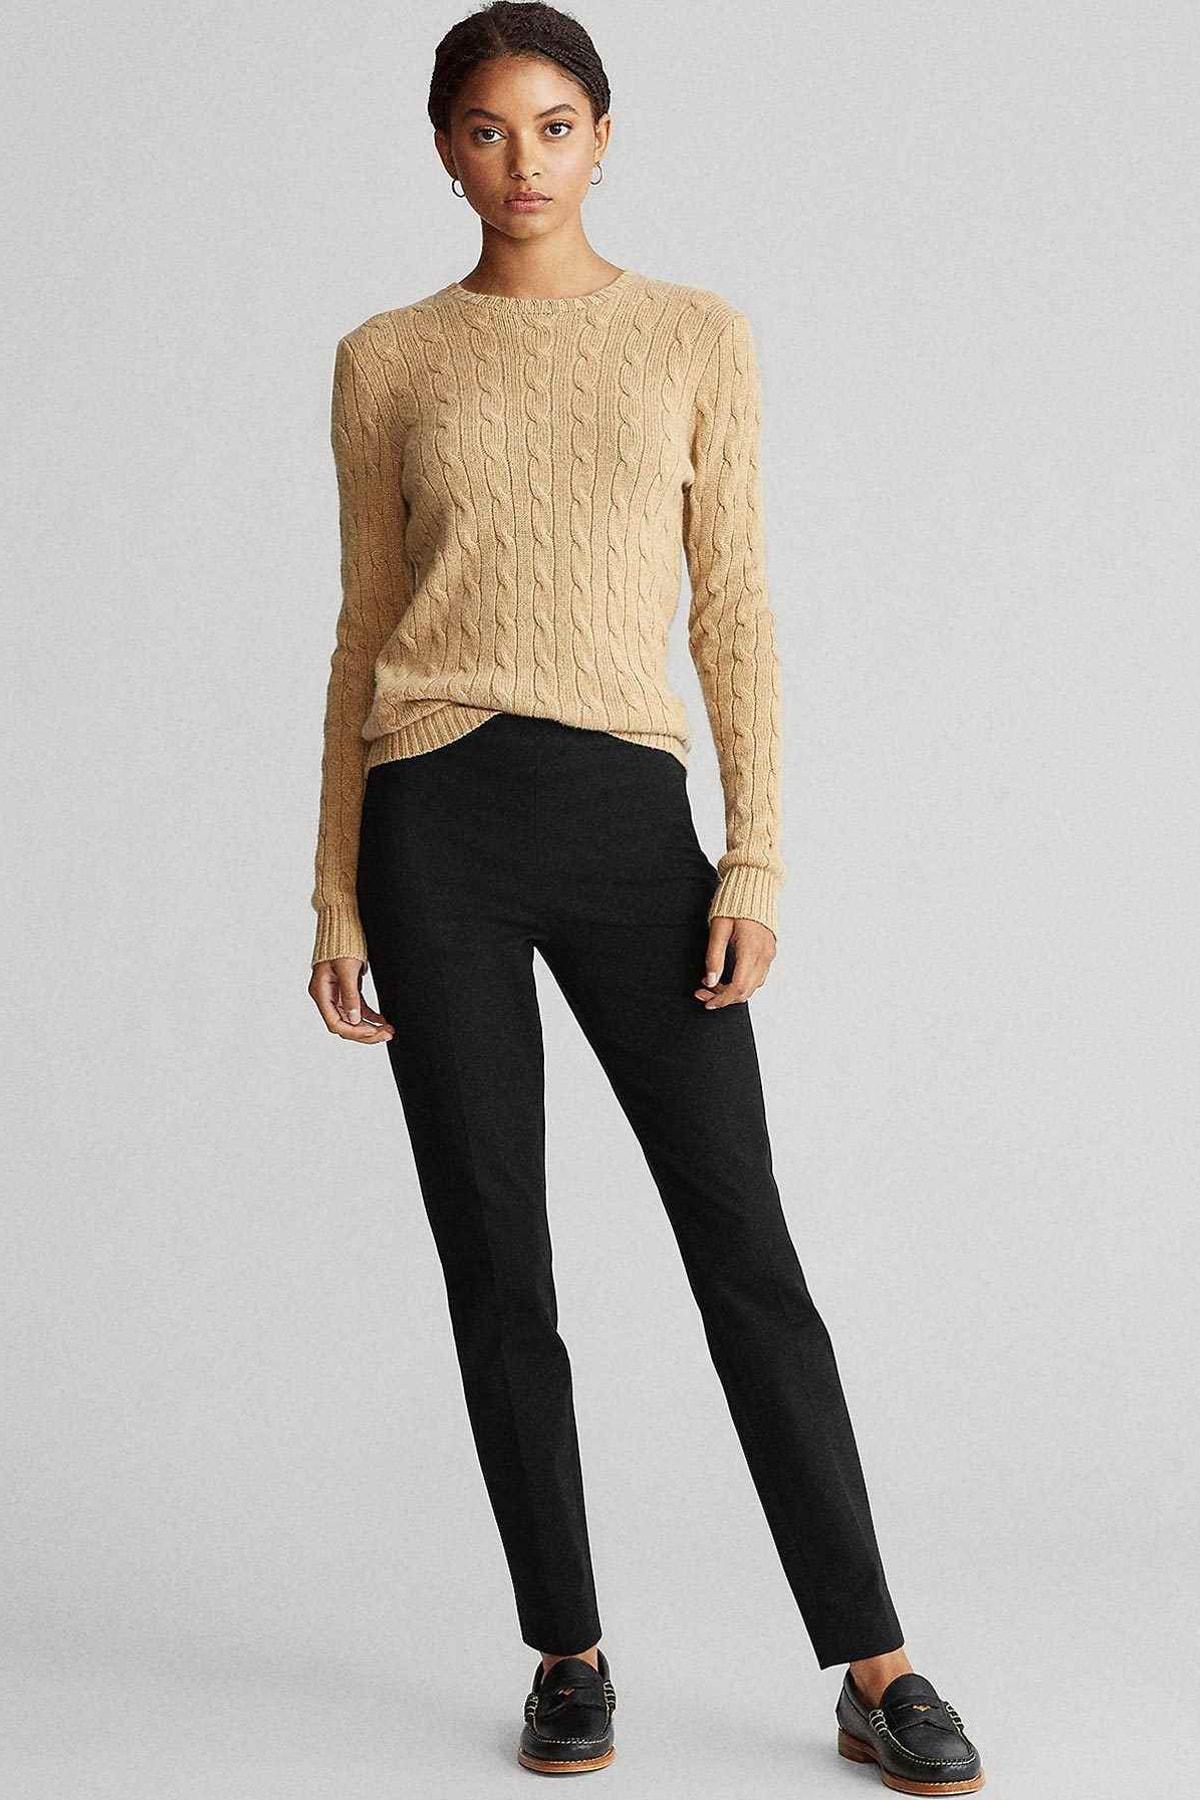 Polo Ralph Lauren Kadın Siyah Pantolon 4484009984052 1